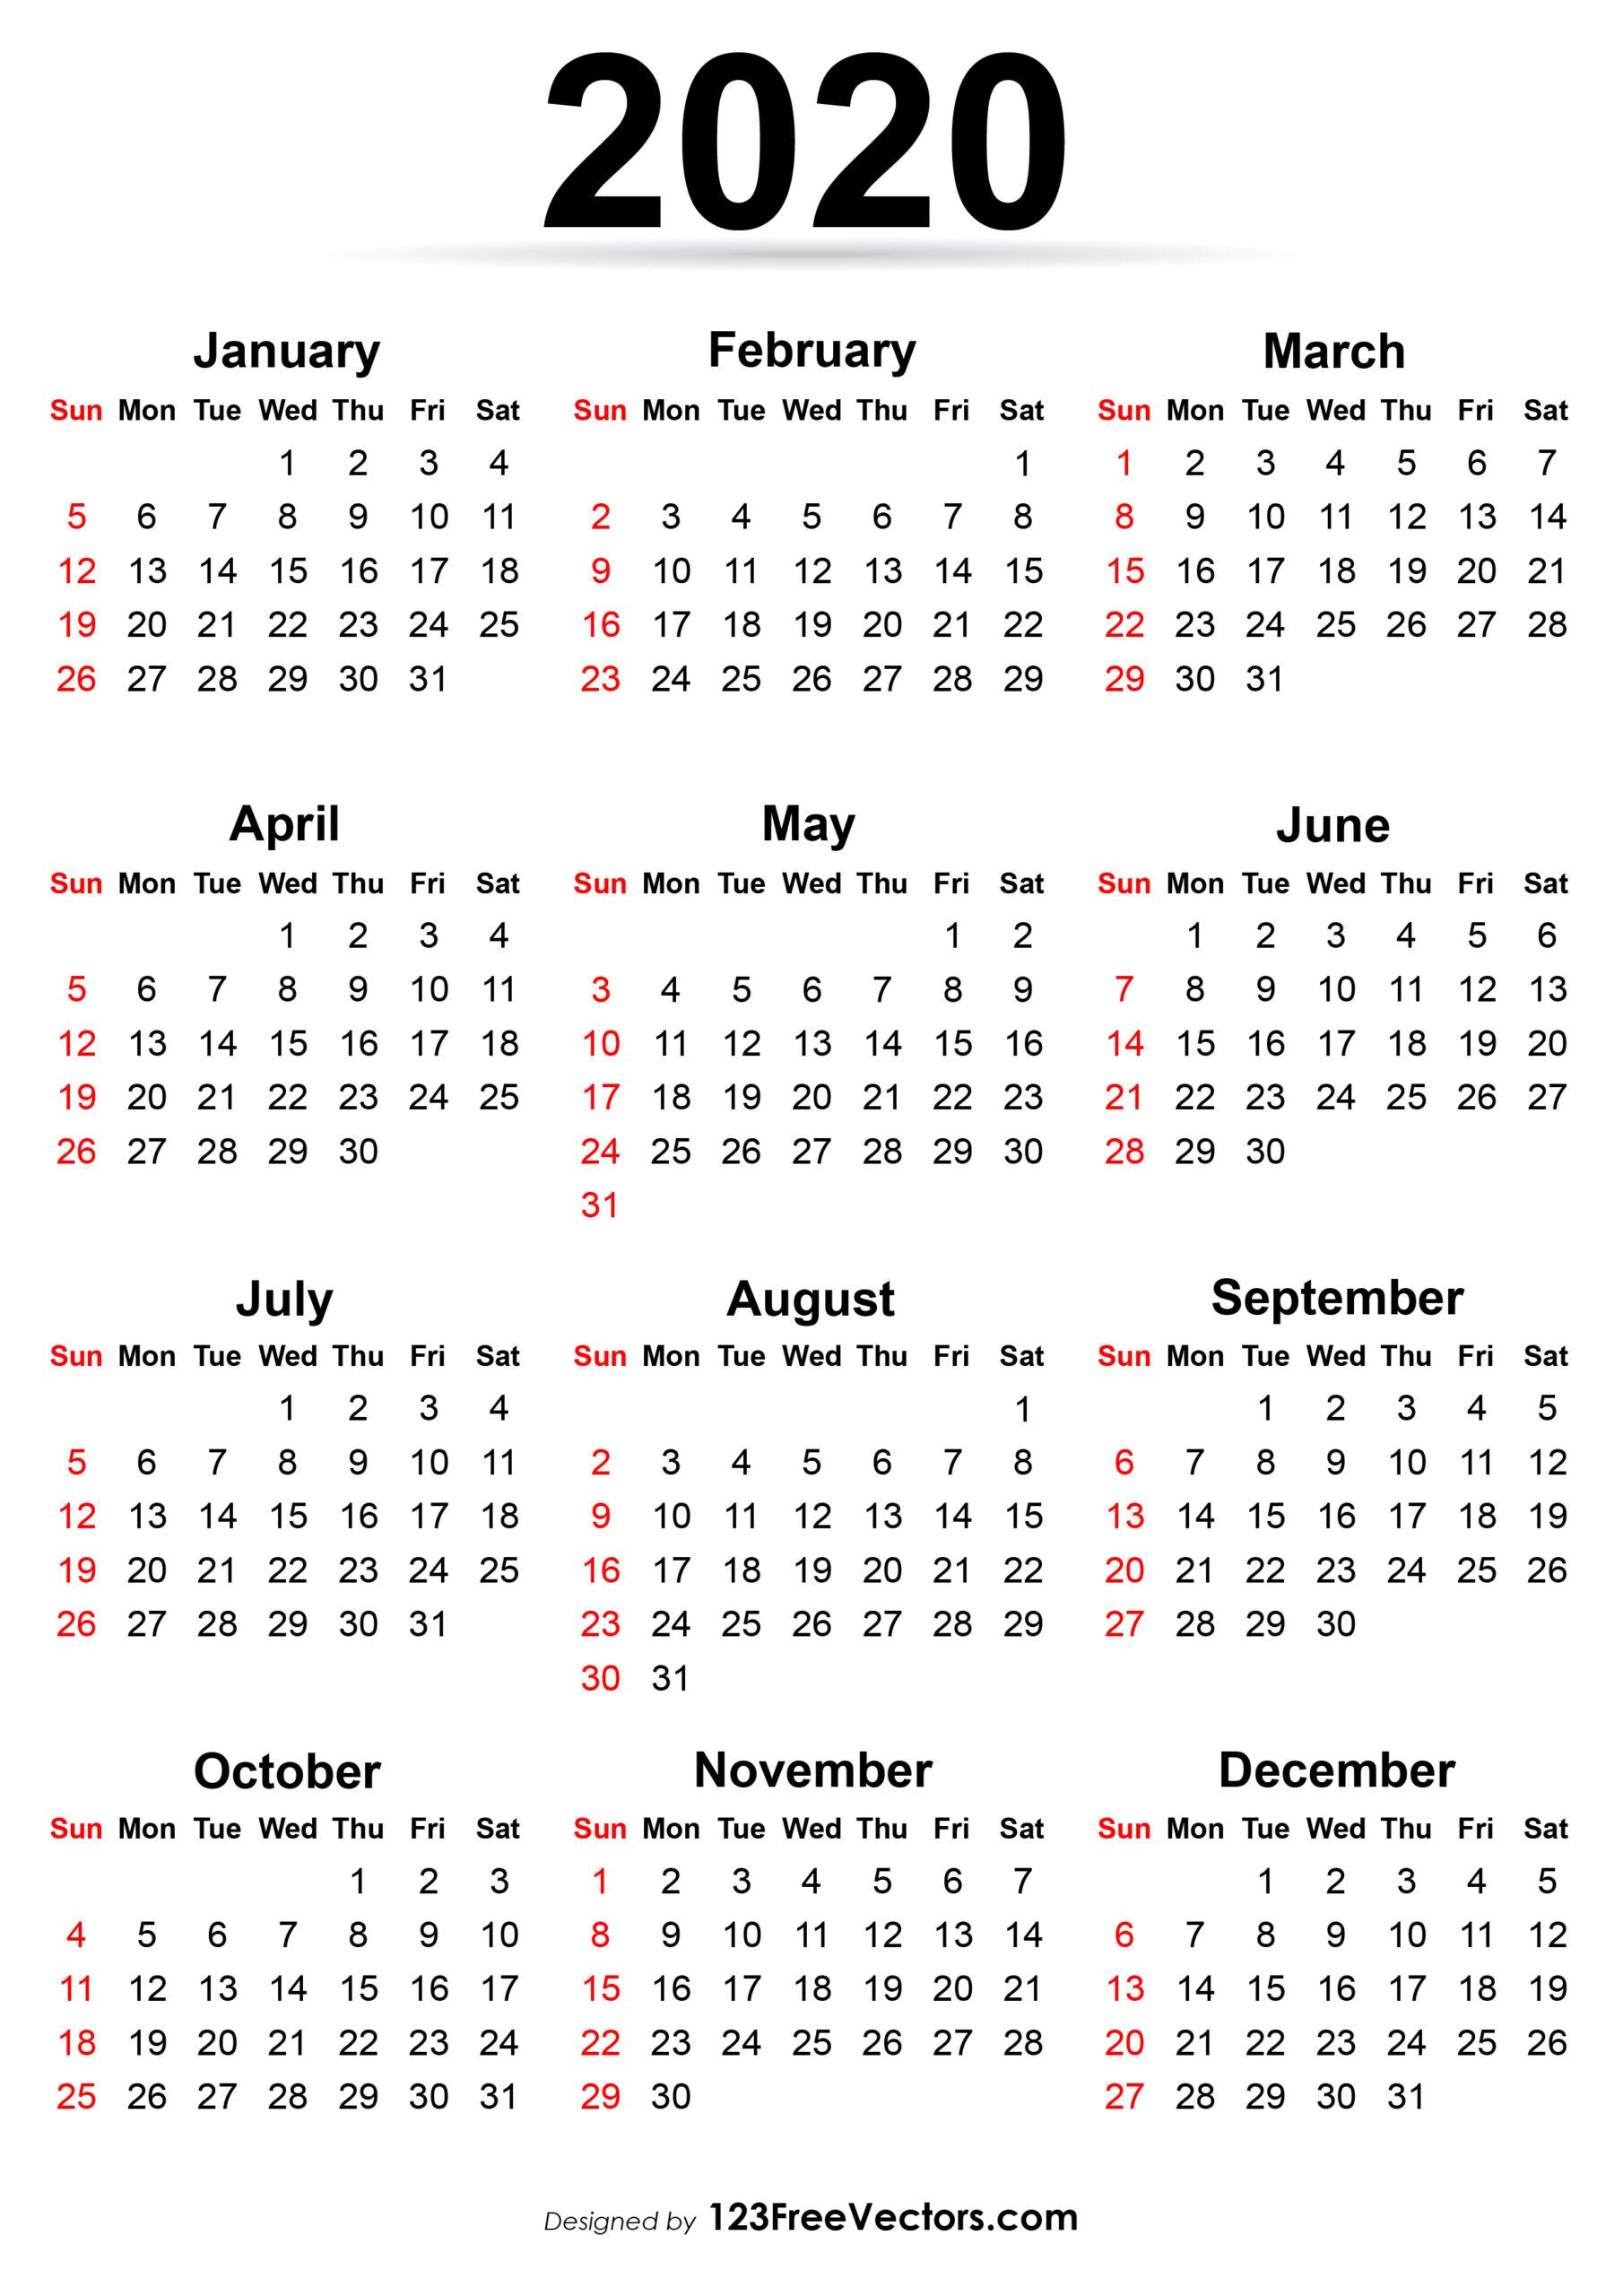 Calendar 2020 To Print | Calendar Printables Free Templates